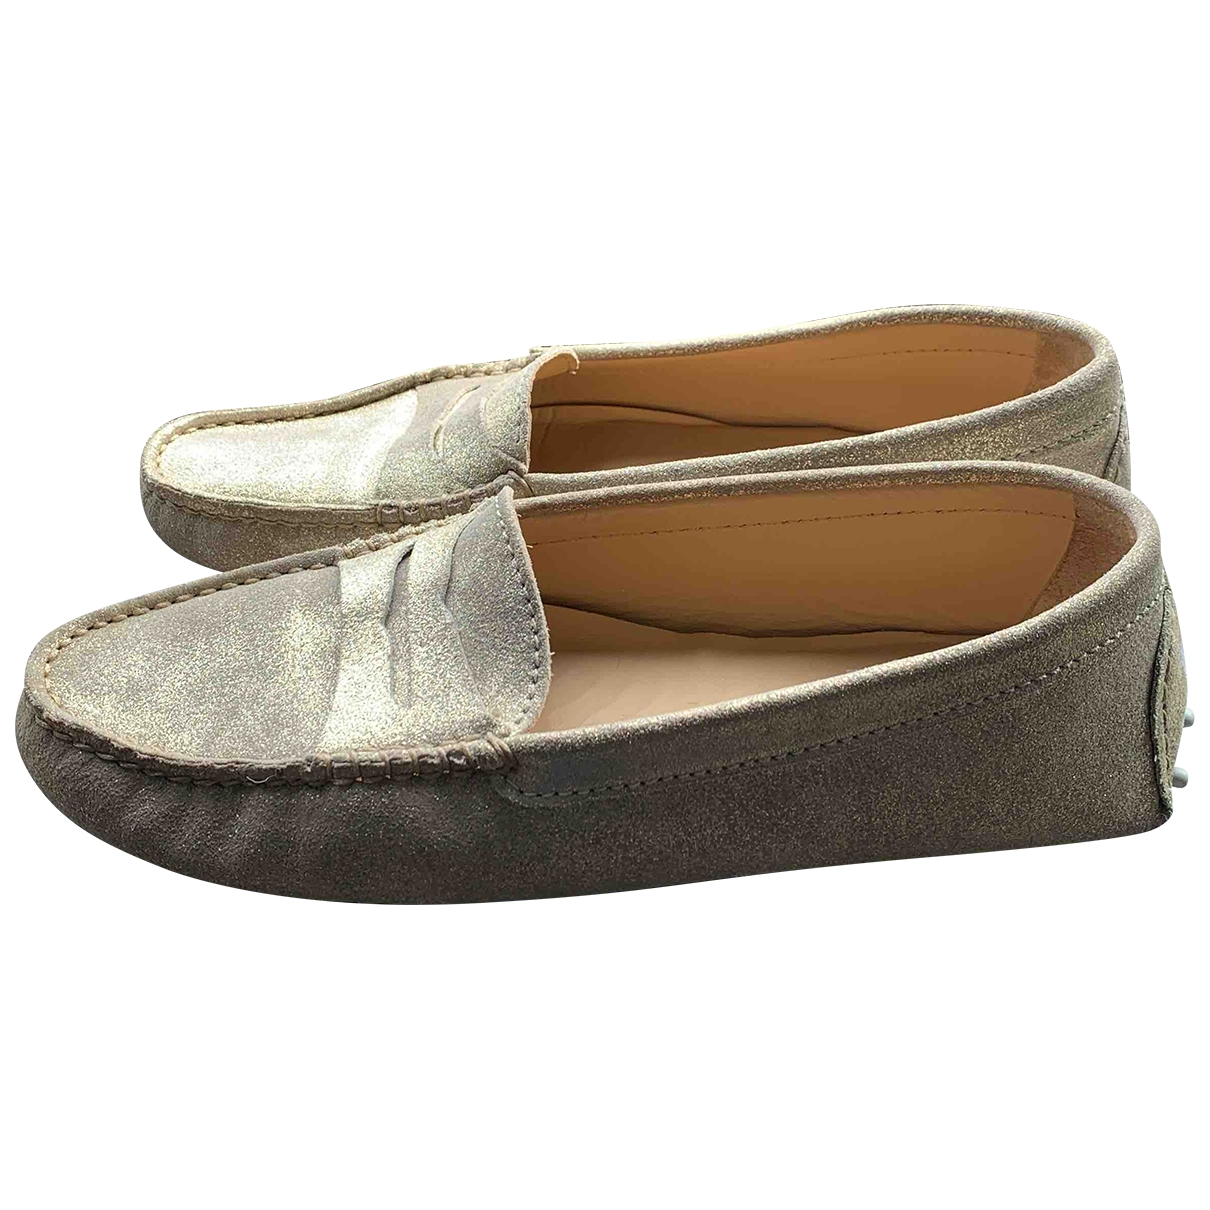 Bobbies \N Gold Leather Flats for Women 38 EU